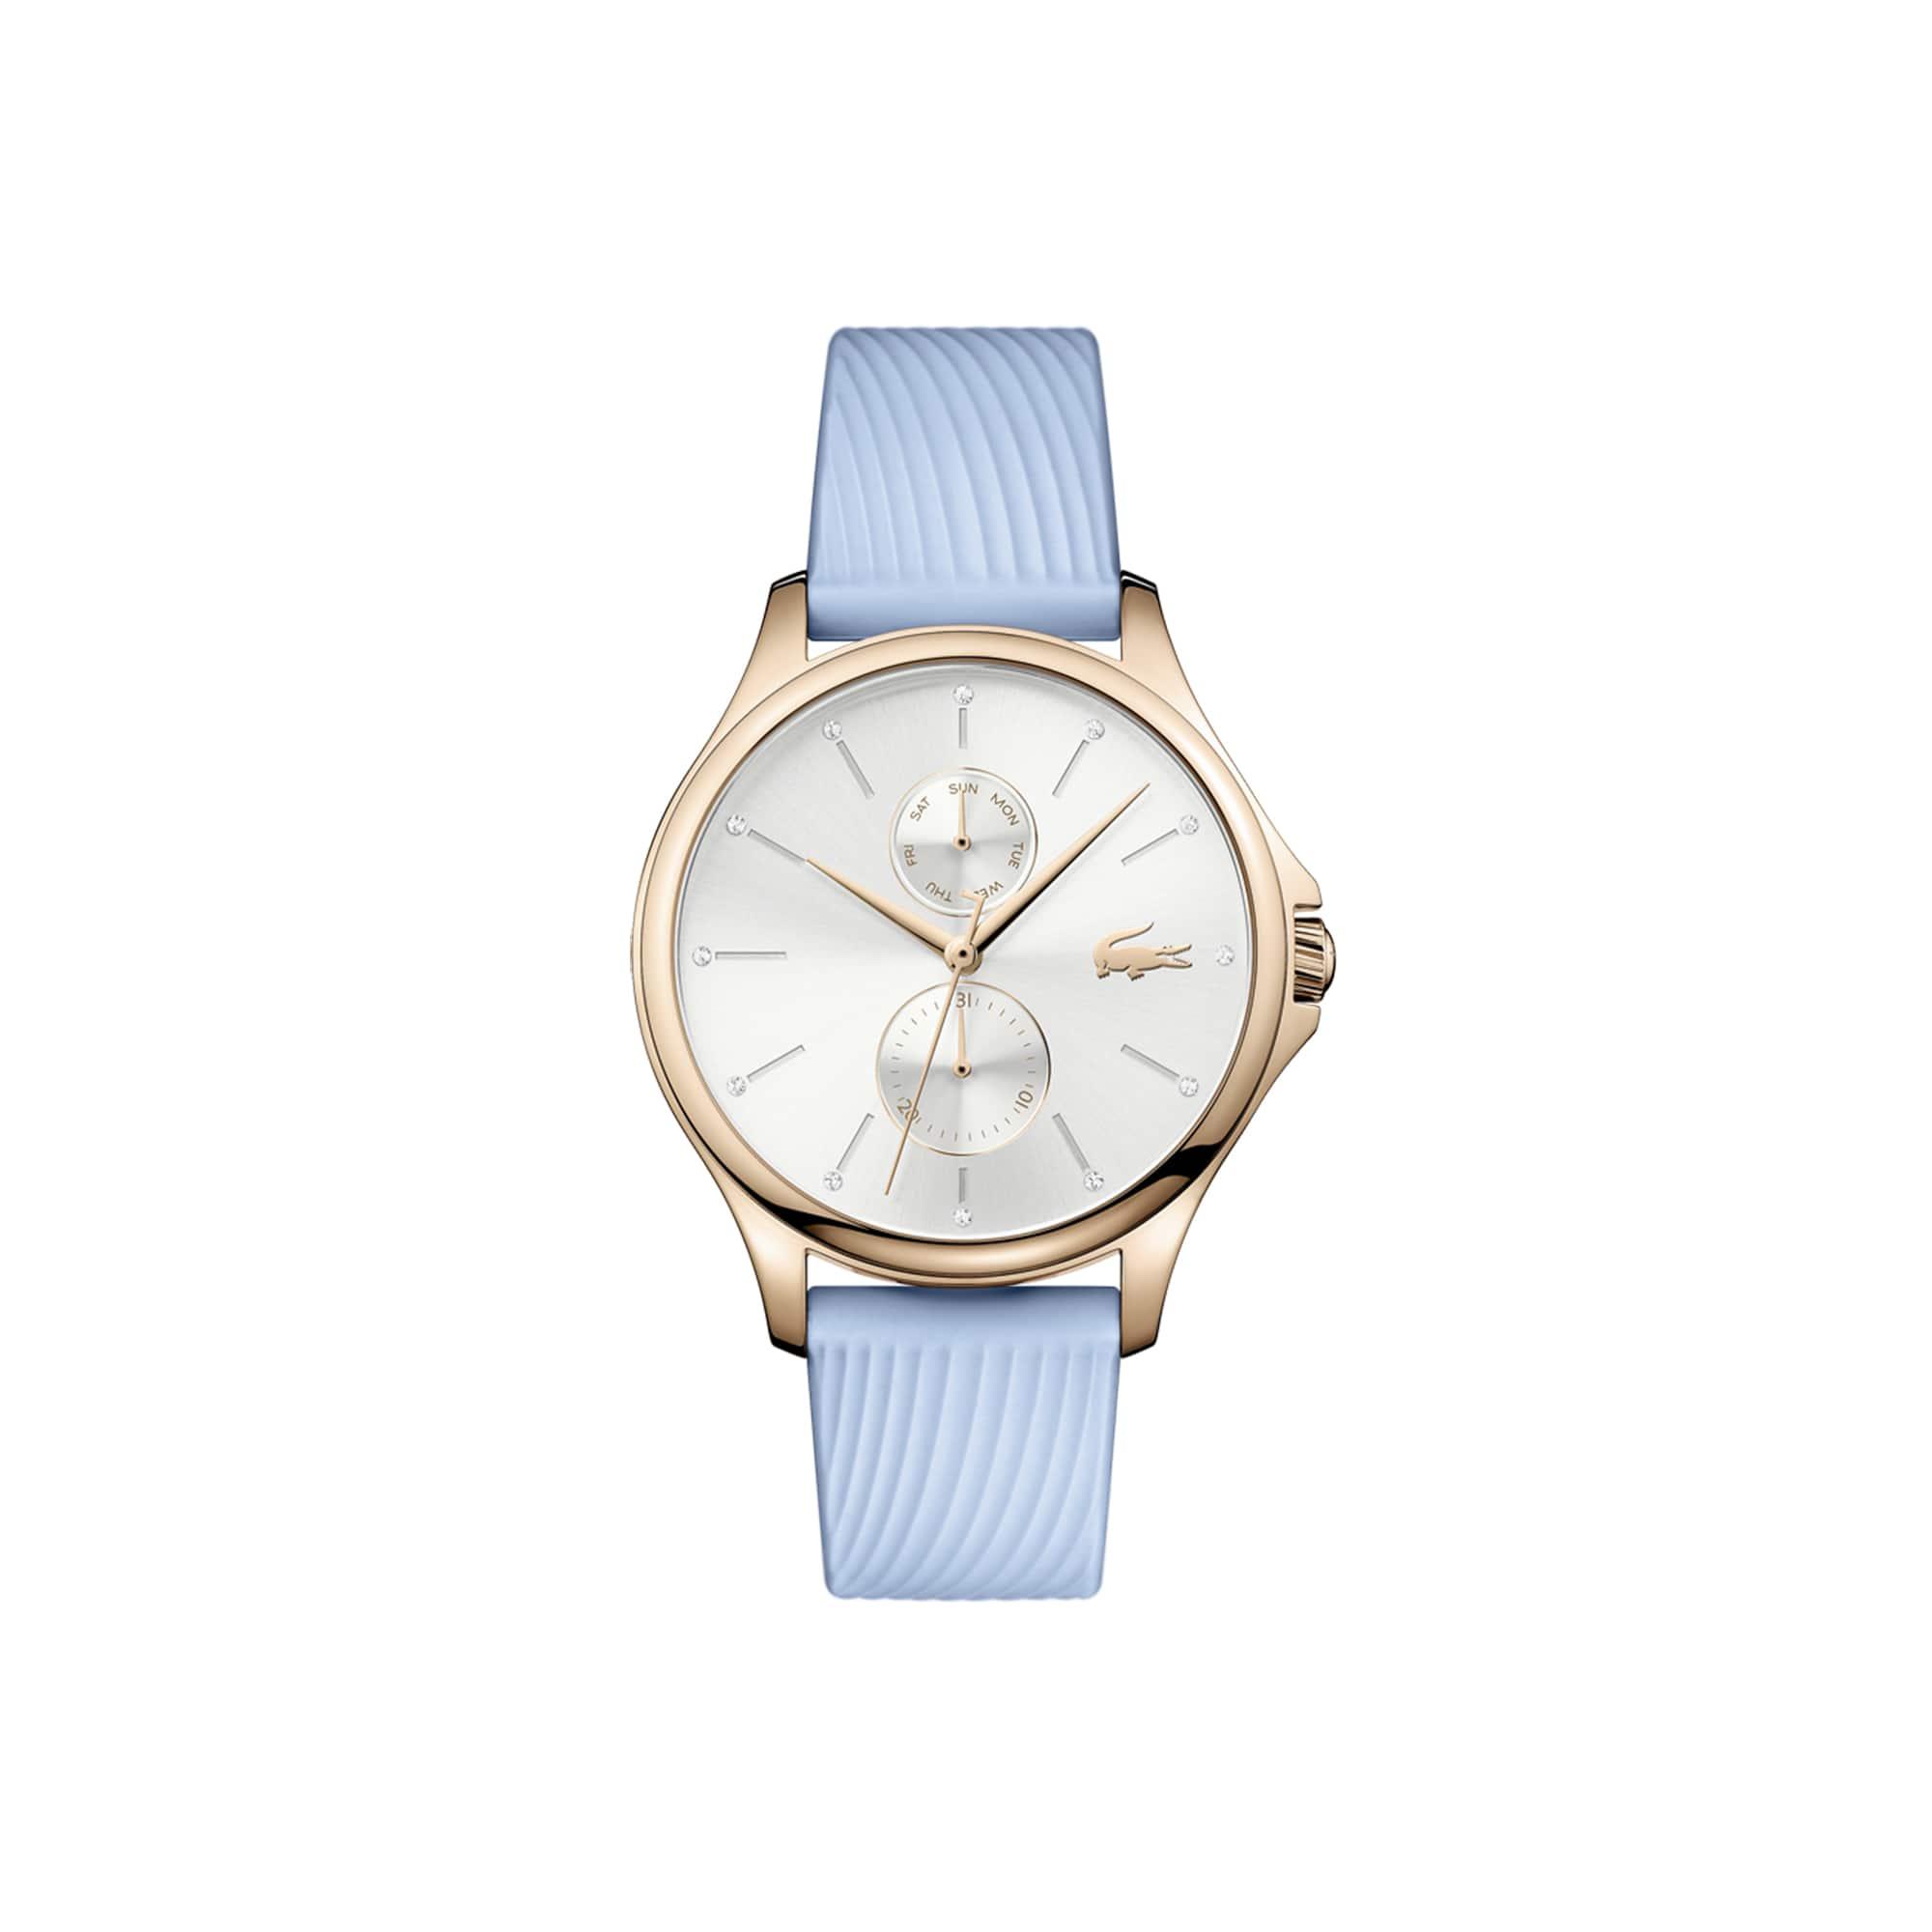 Multifunctioneel horloge Kea met blauwe siliconenband